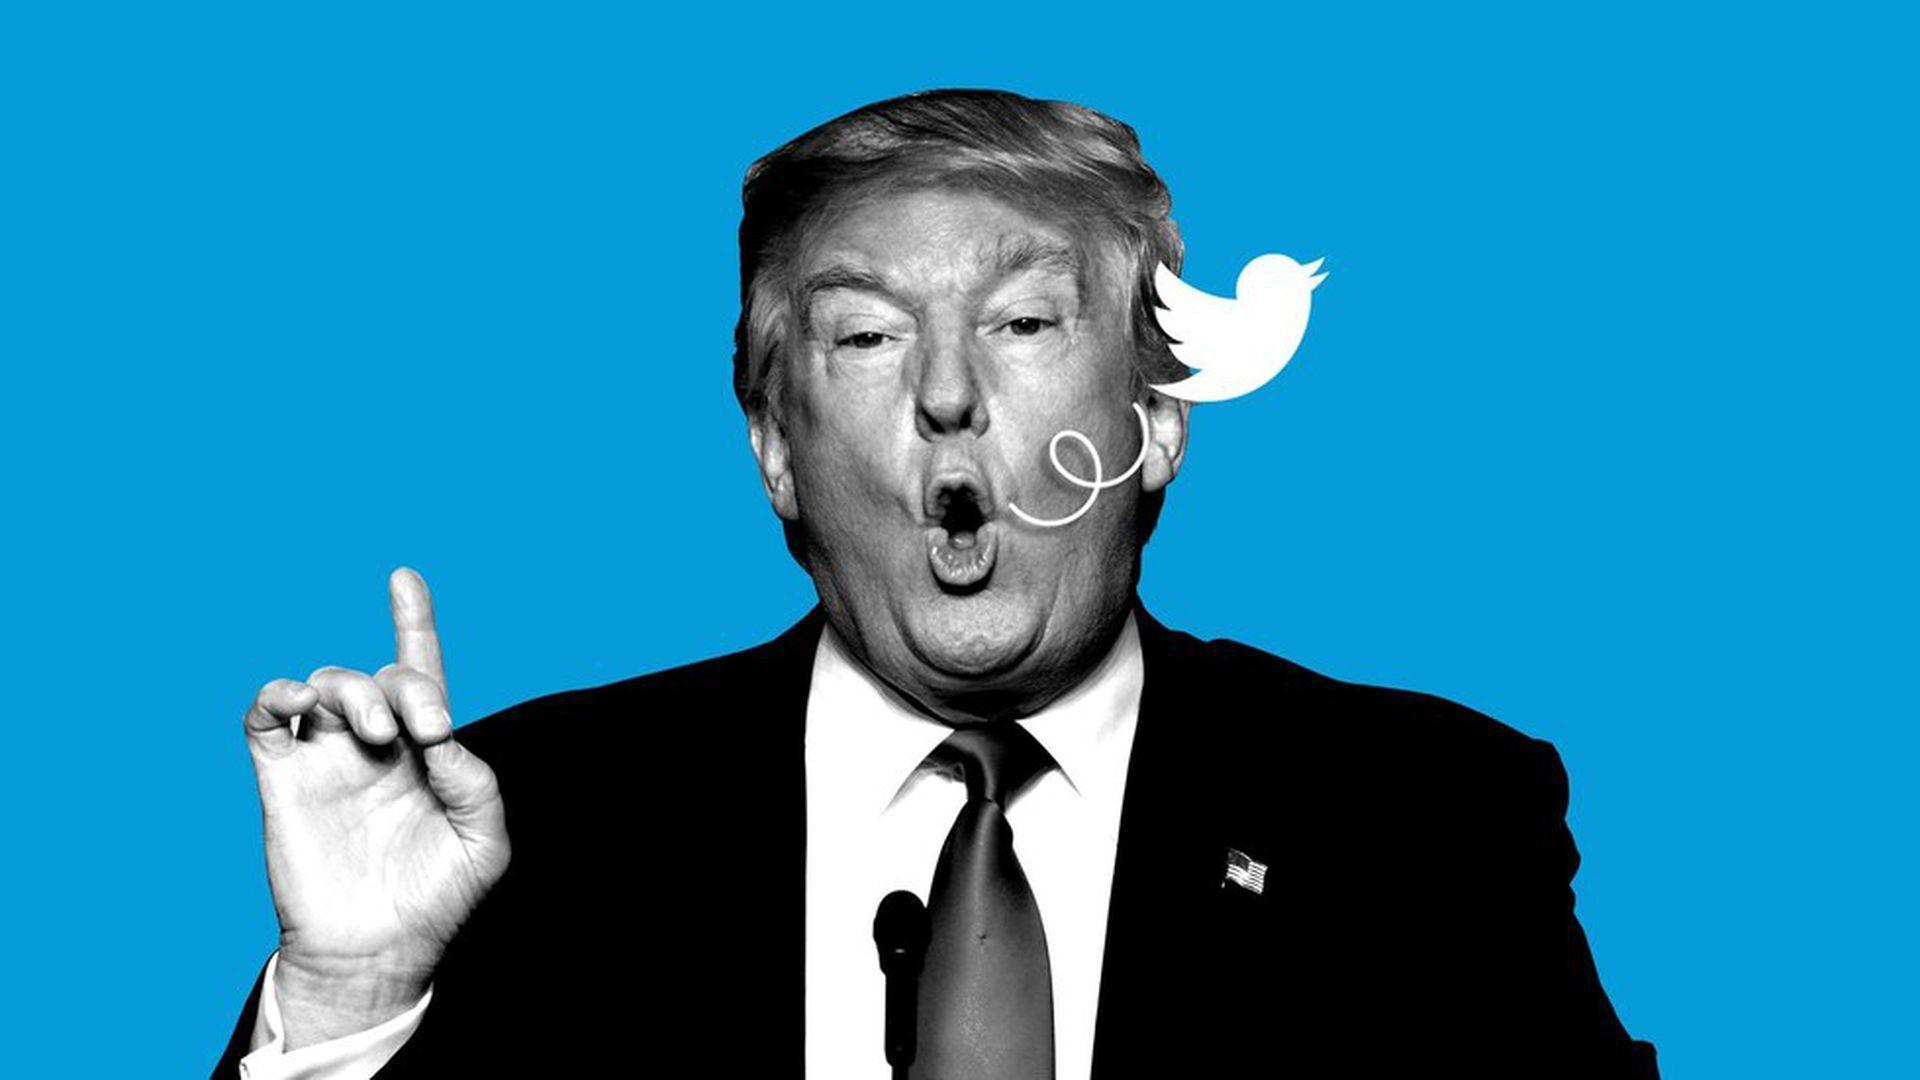 Trump tweeting illustration